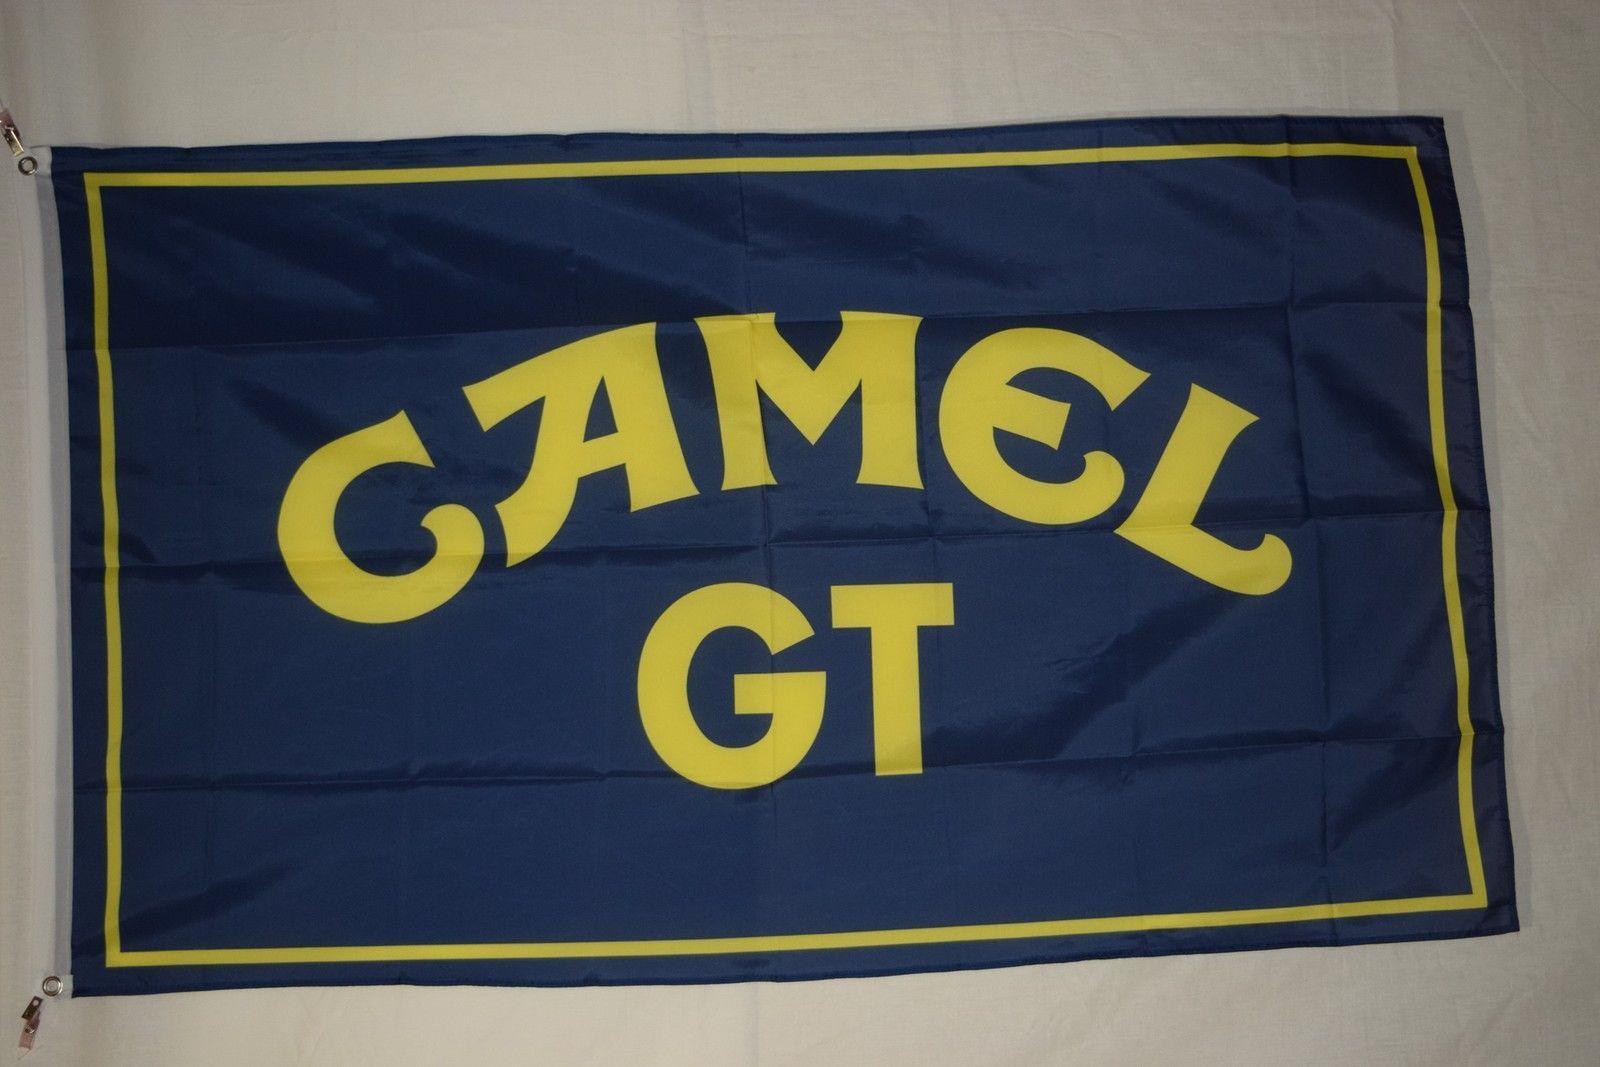 Camel Gt Advertising Promotional Flag Banner 3X5 Outdoor Flag Custom ...